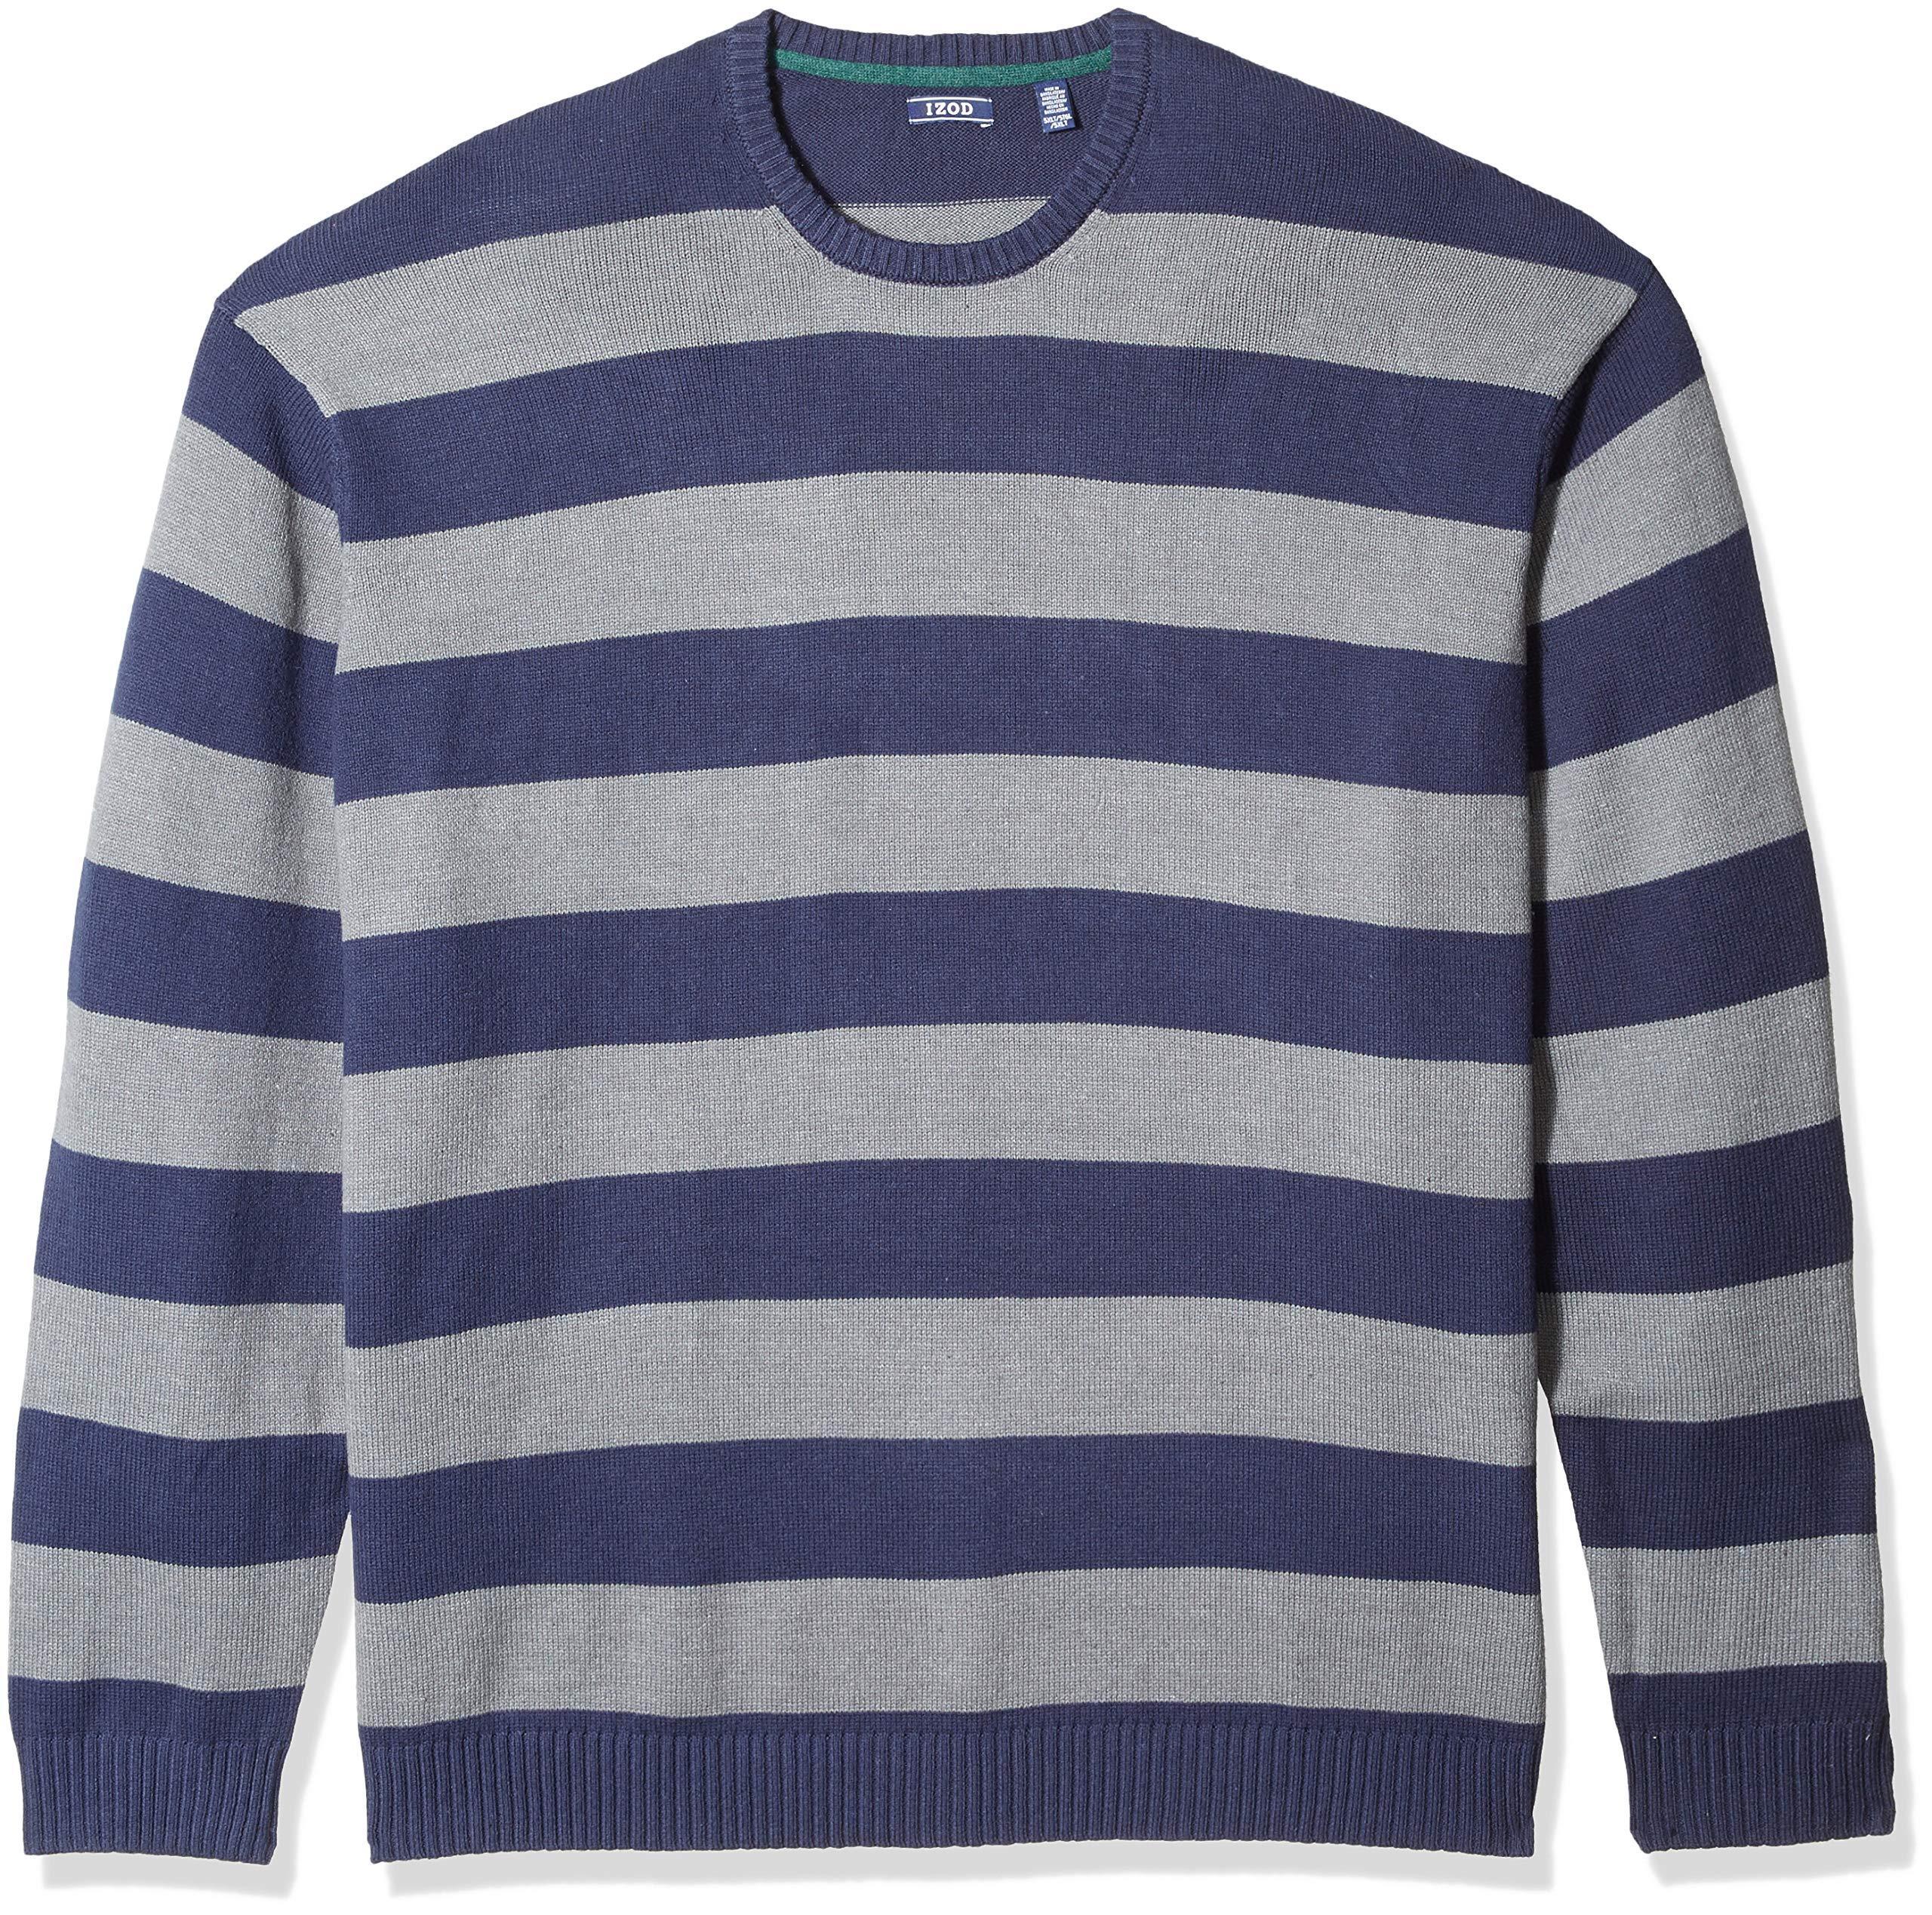 IZOD Mens Shaker Quarter Zip 7 Gauge Ribbed Sweater